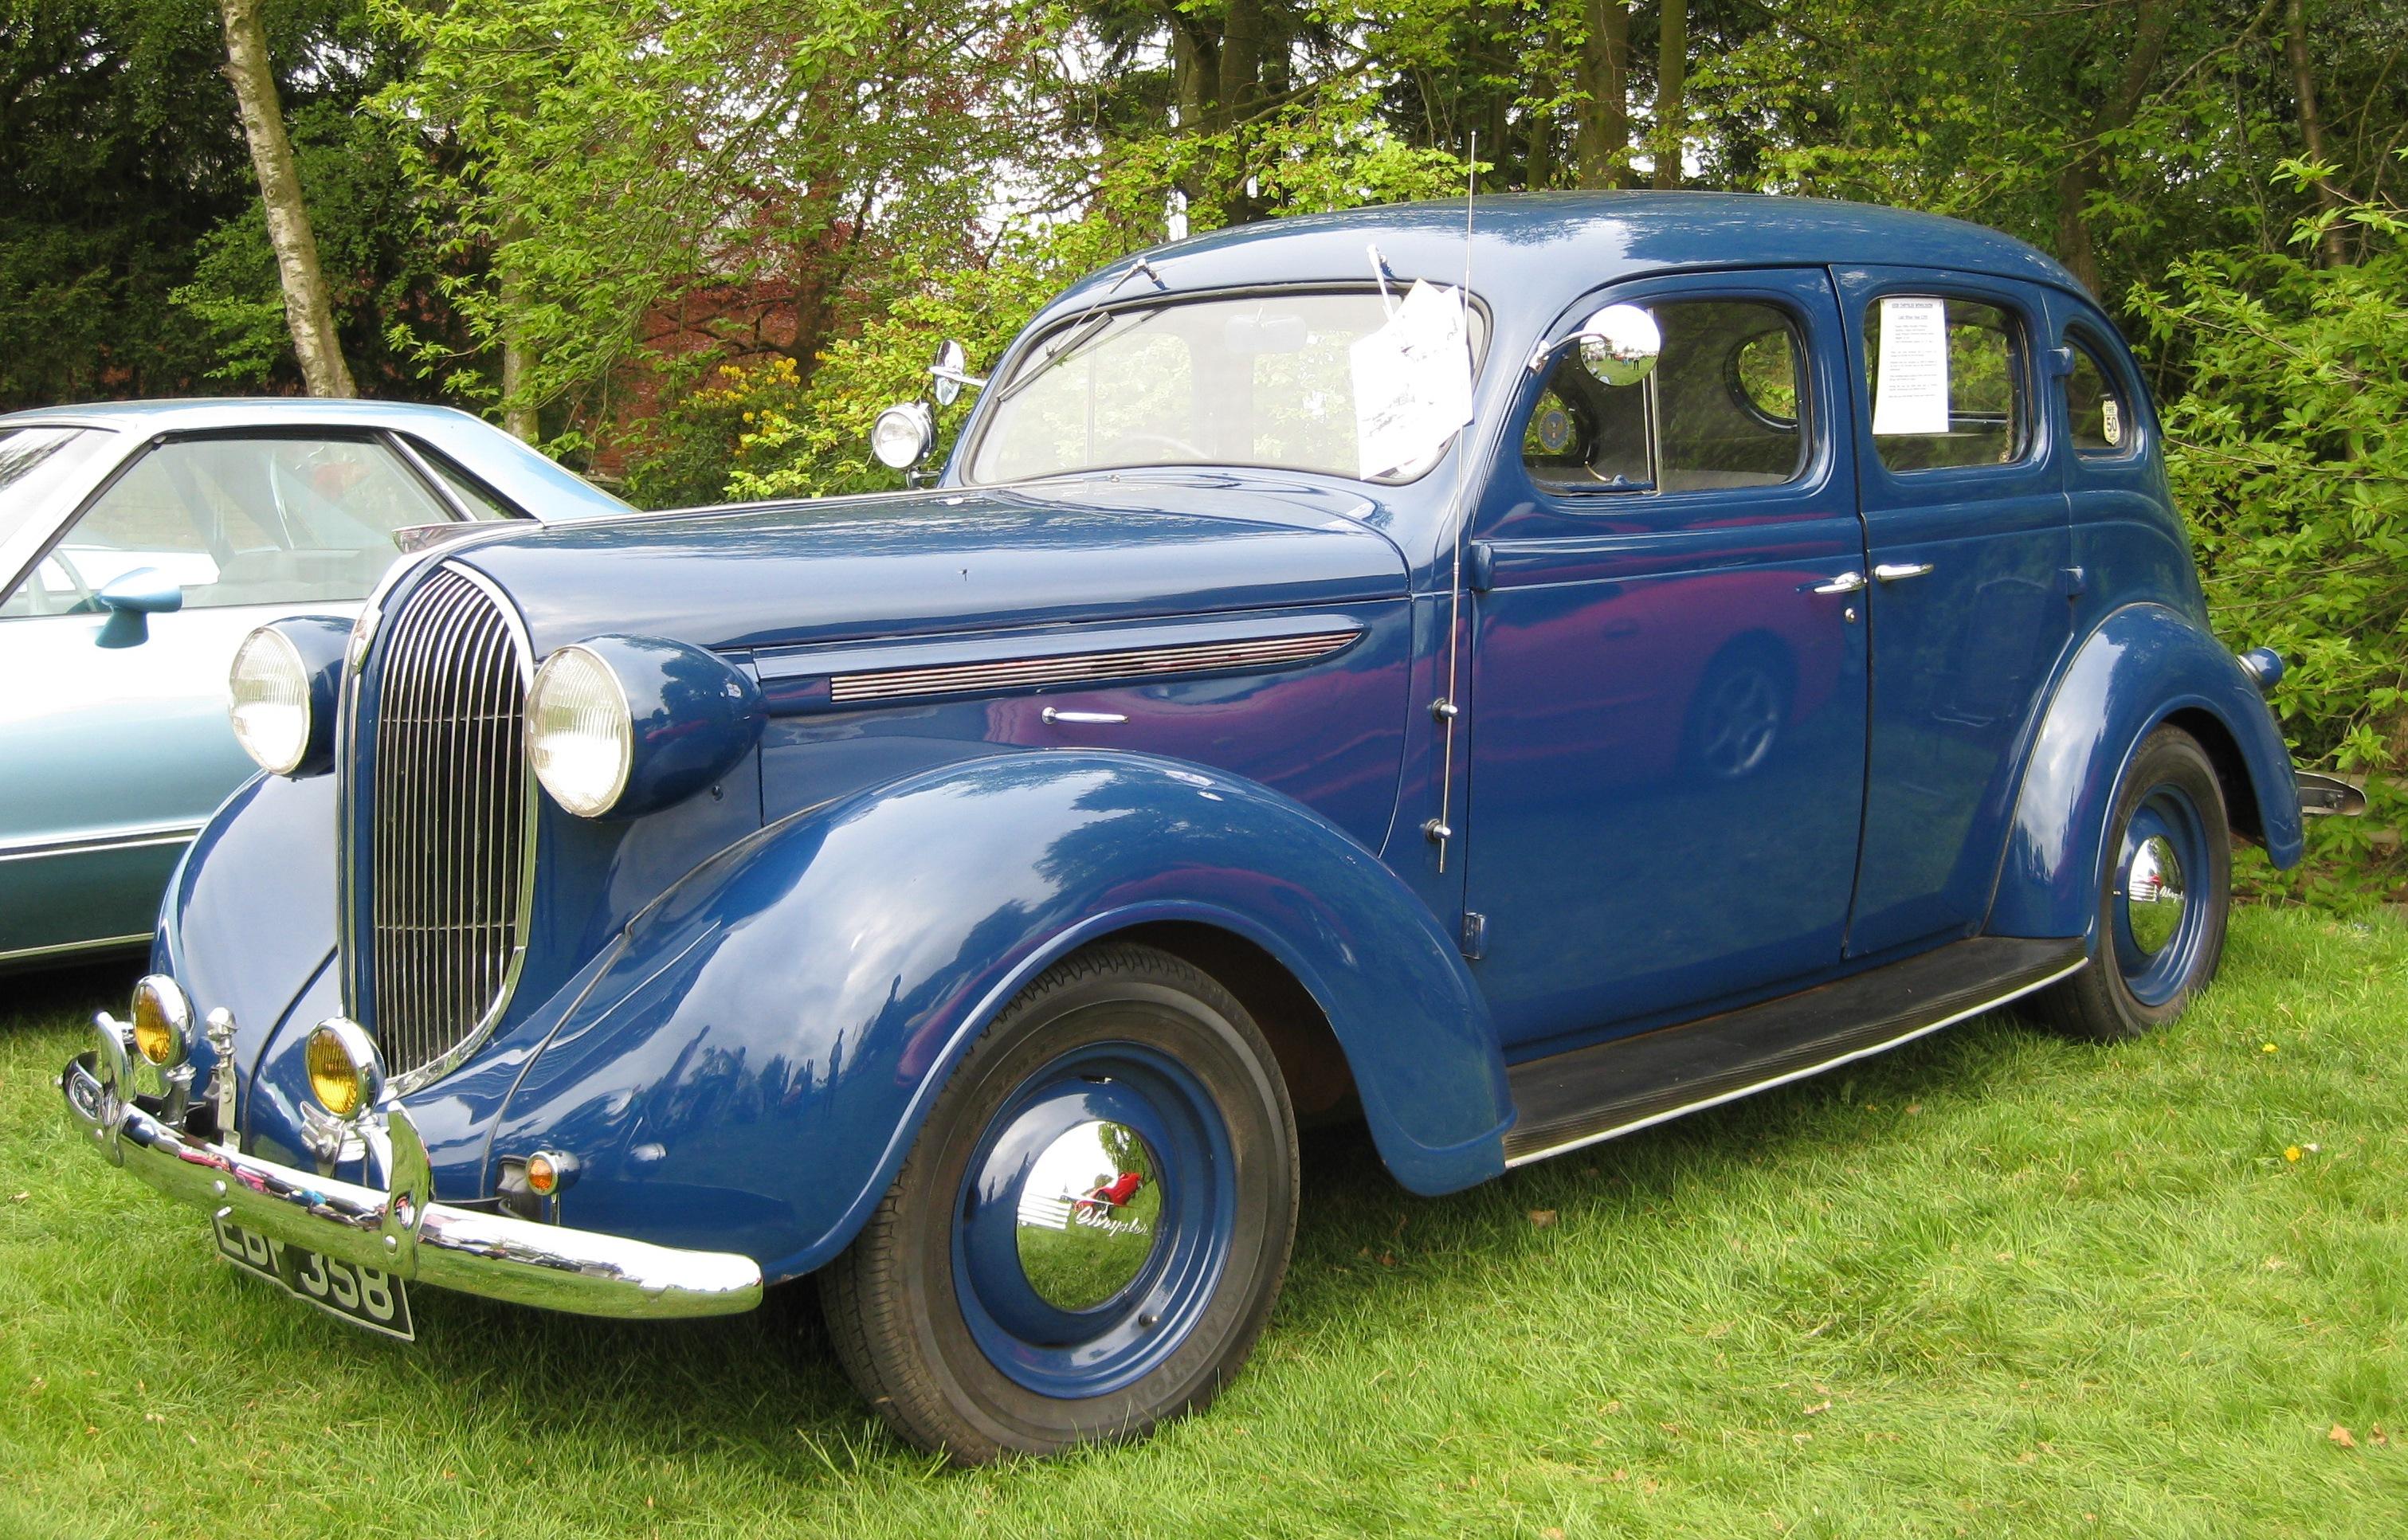 Auto Park Plymouth >> File:Chrysler Wimbledon aka Plymouth P6 1938.JPG - Wikimedia Commons